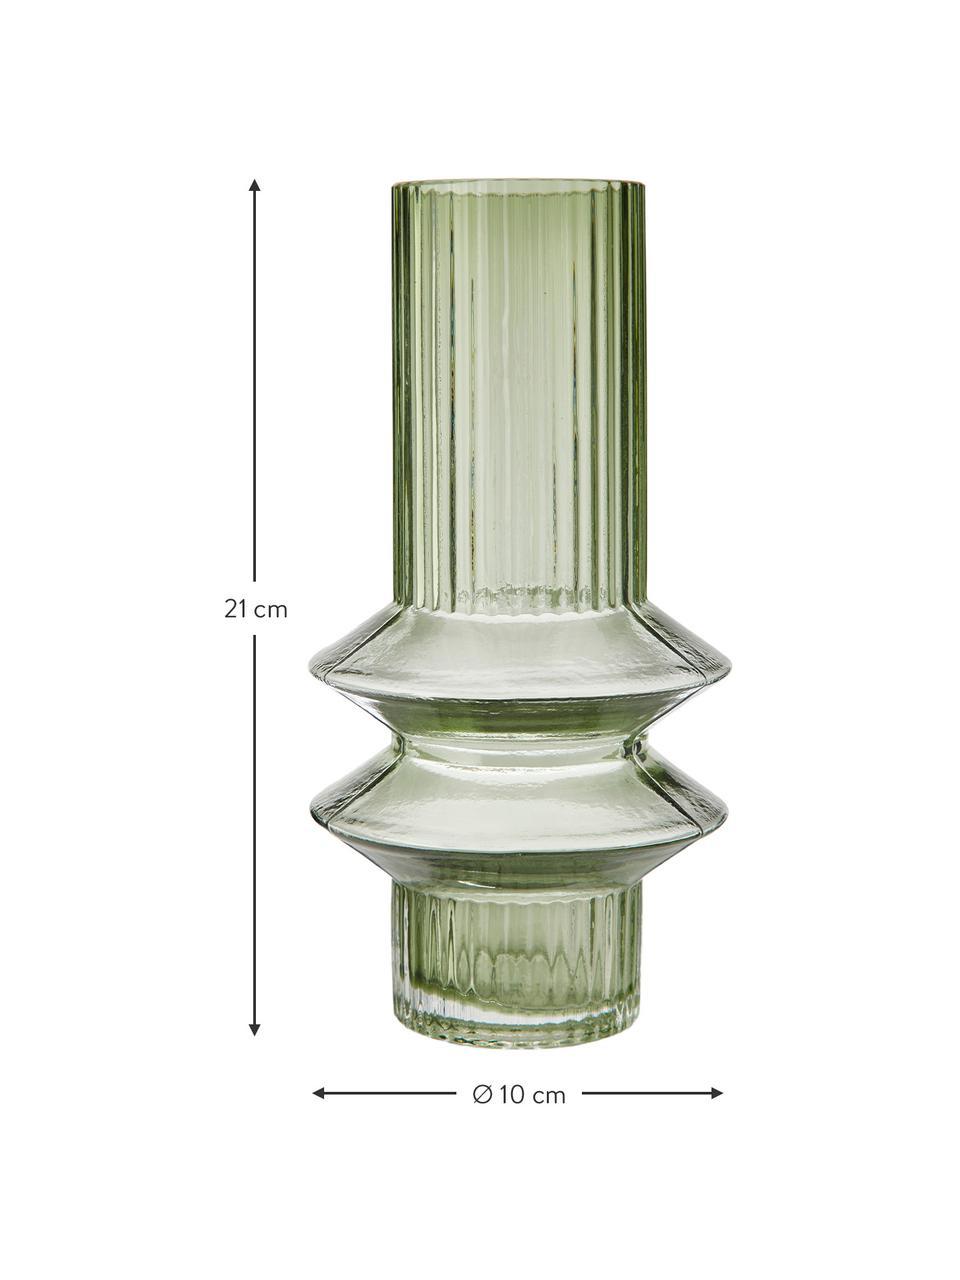 Transparante glazen vaas Rilla met een groene glans, Glas, Groen, Ø 10 x H 21 cm